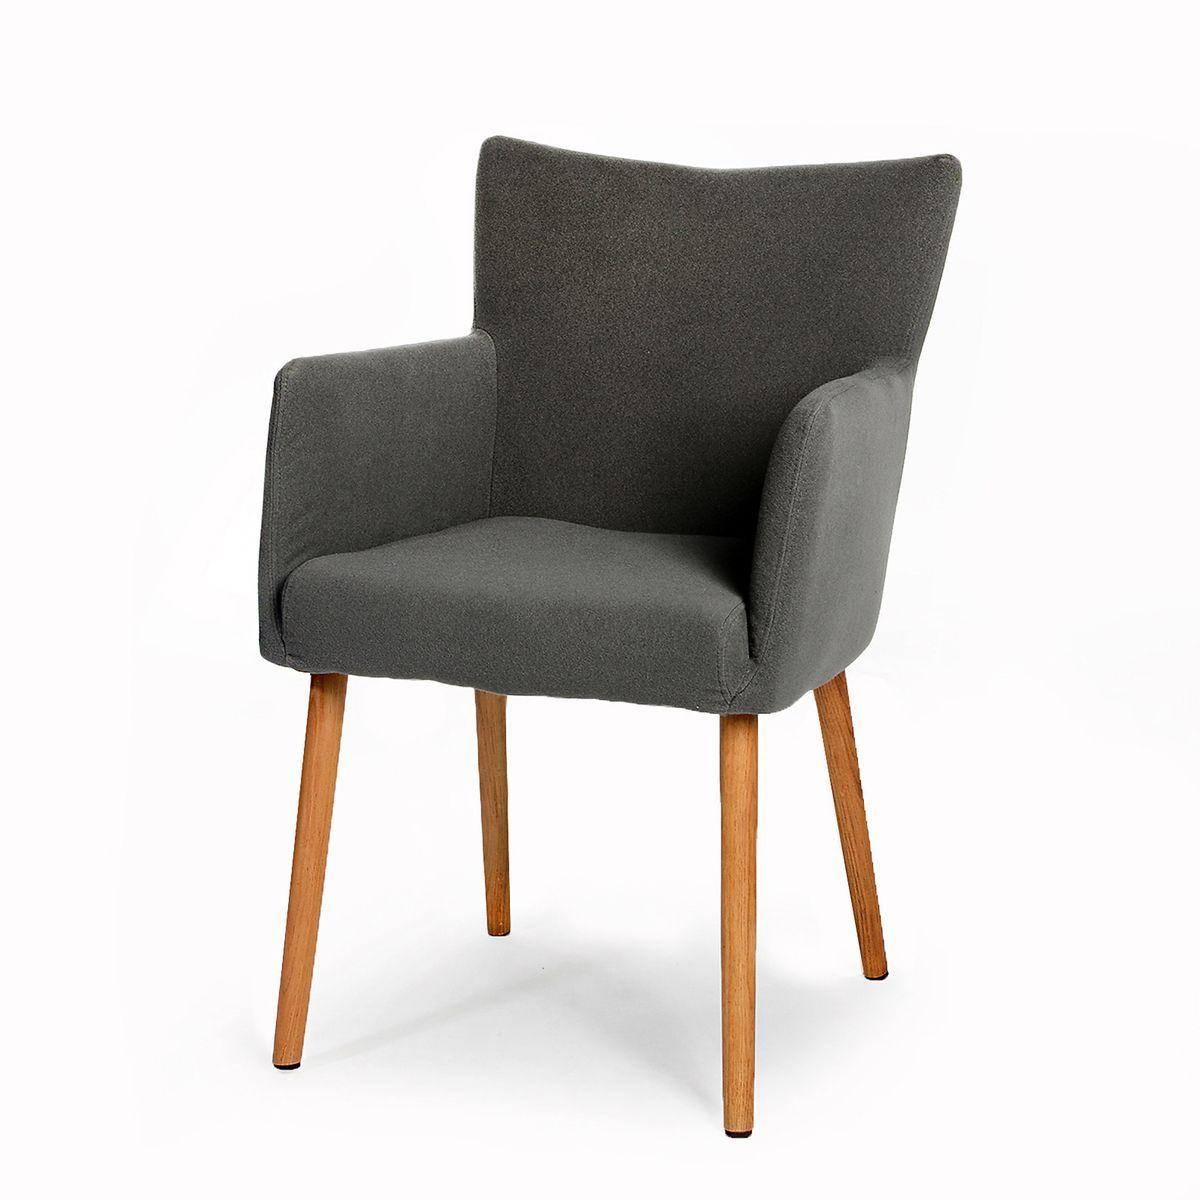 Stuhl nellie viskose elastan eiche grau ca b 48 x h 87 x t 59 cm schreibtischwand - Stuhl grau eiche ...